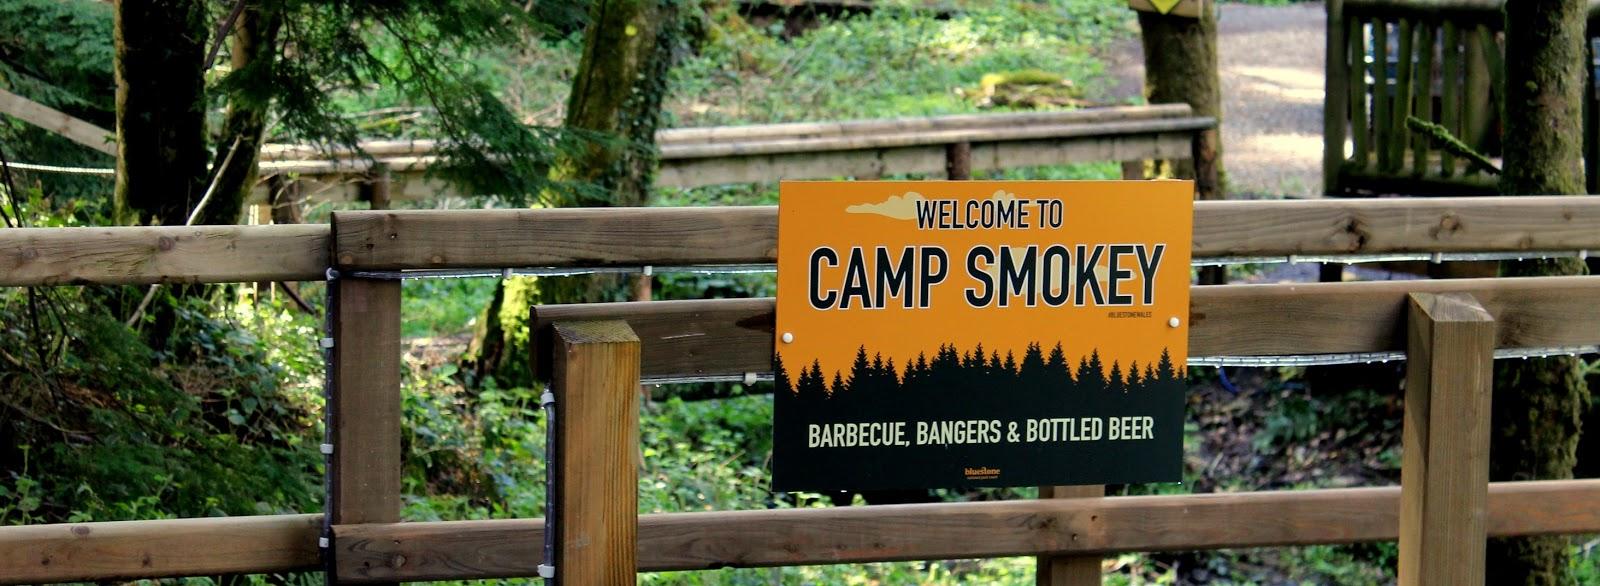 camp smokey sign at bluestone wales